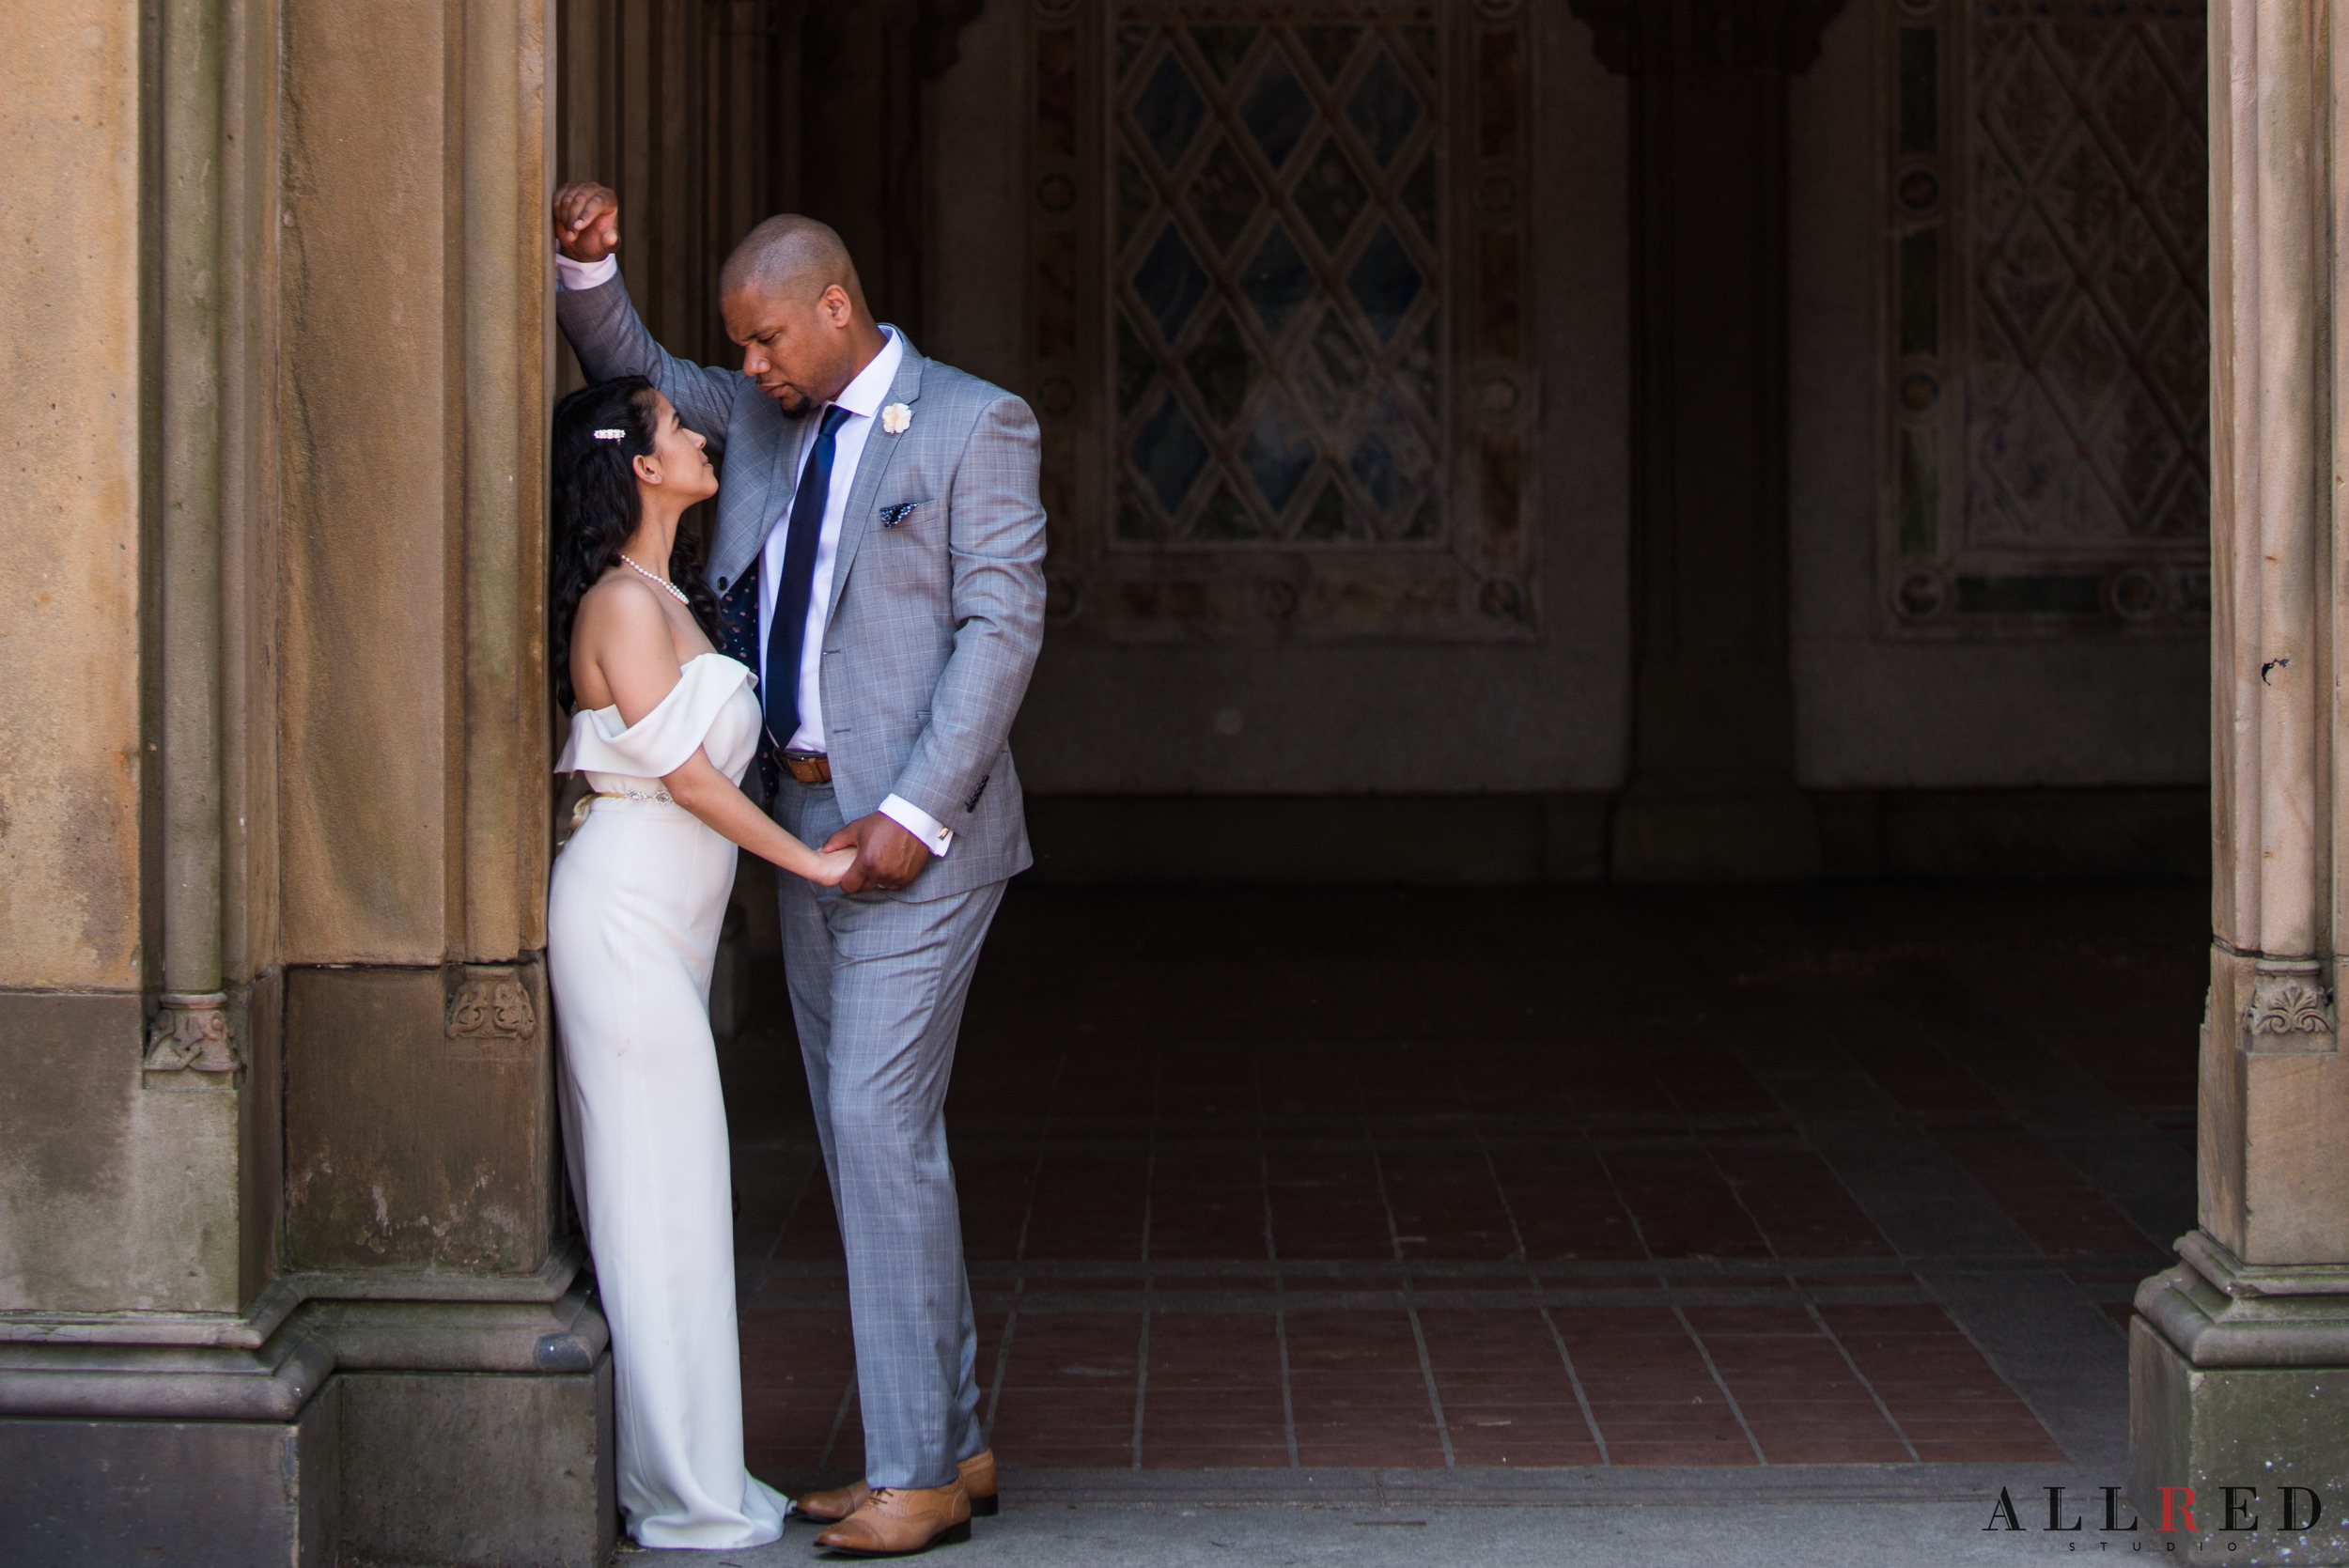 Wedding-central-park-allred-studio-new-york-photographer-new-jersey-hudson-valley-2569.jpg